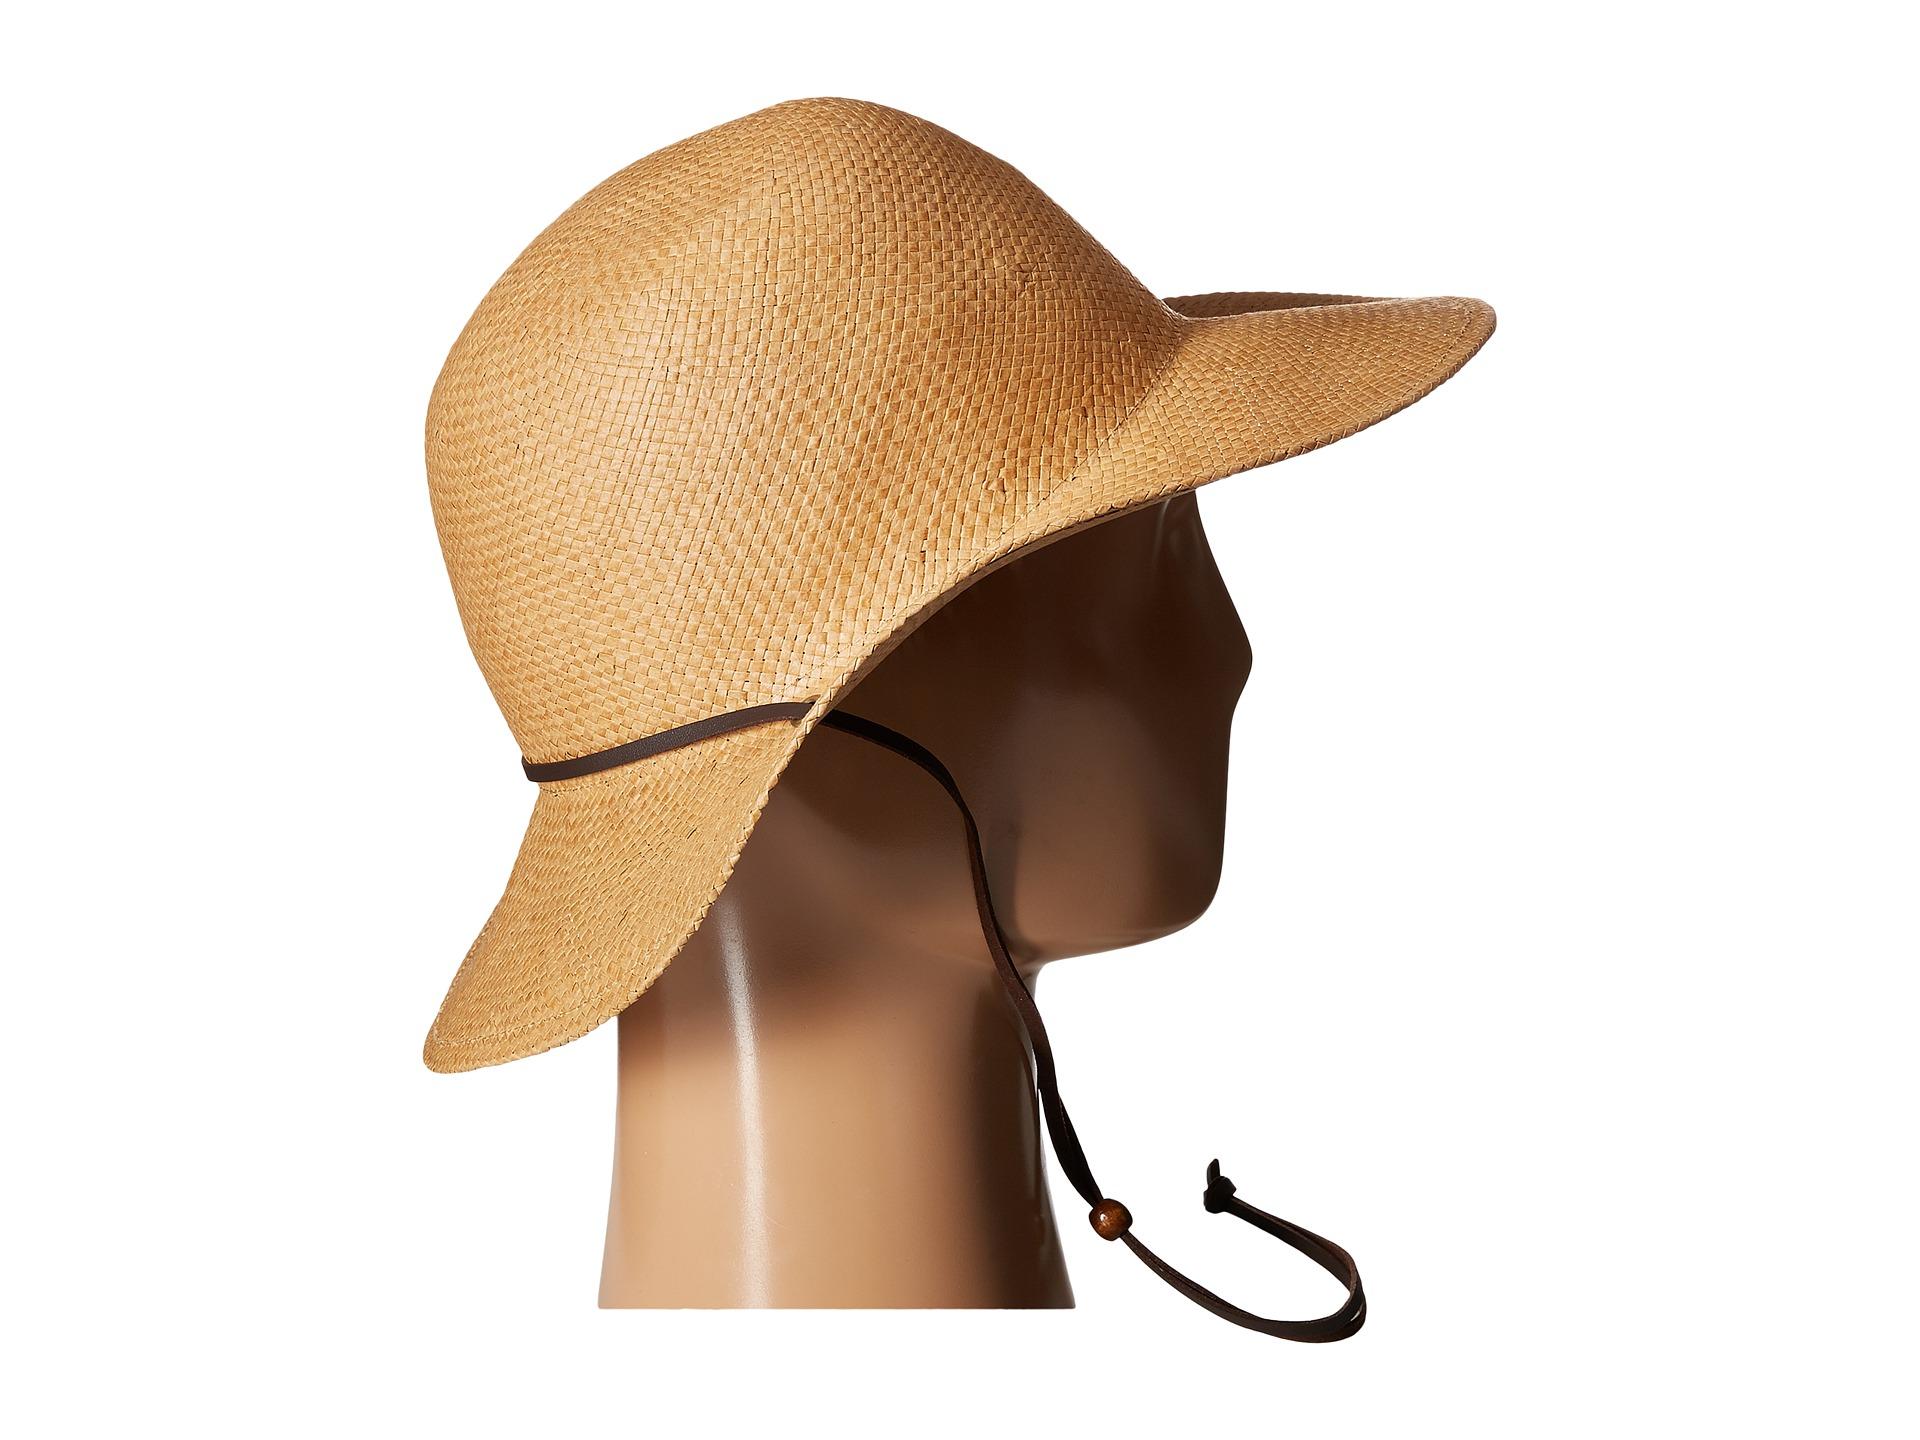 obey brim hat zappos free shipping both ways